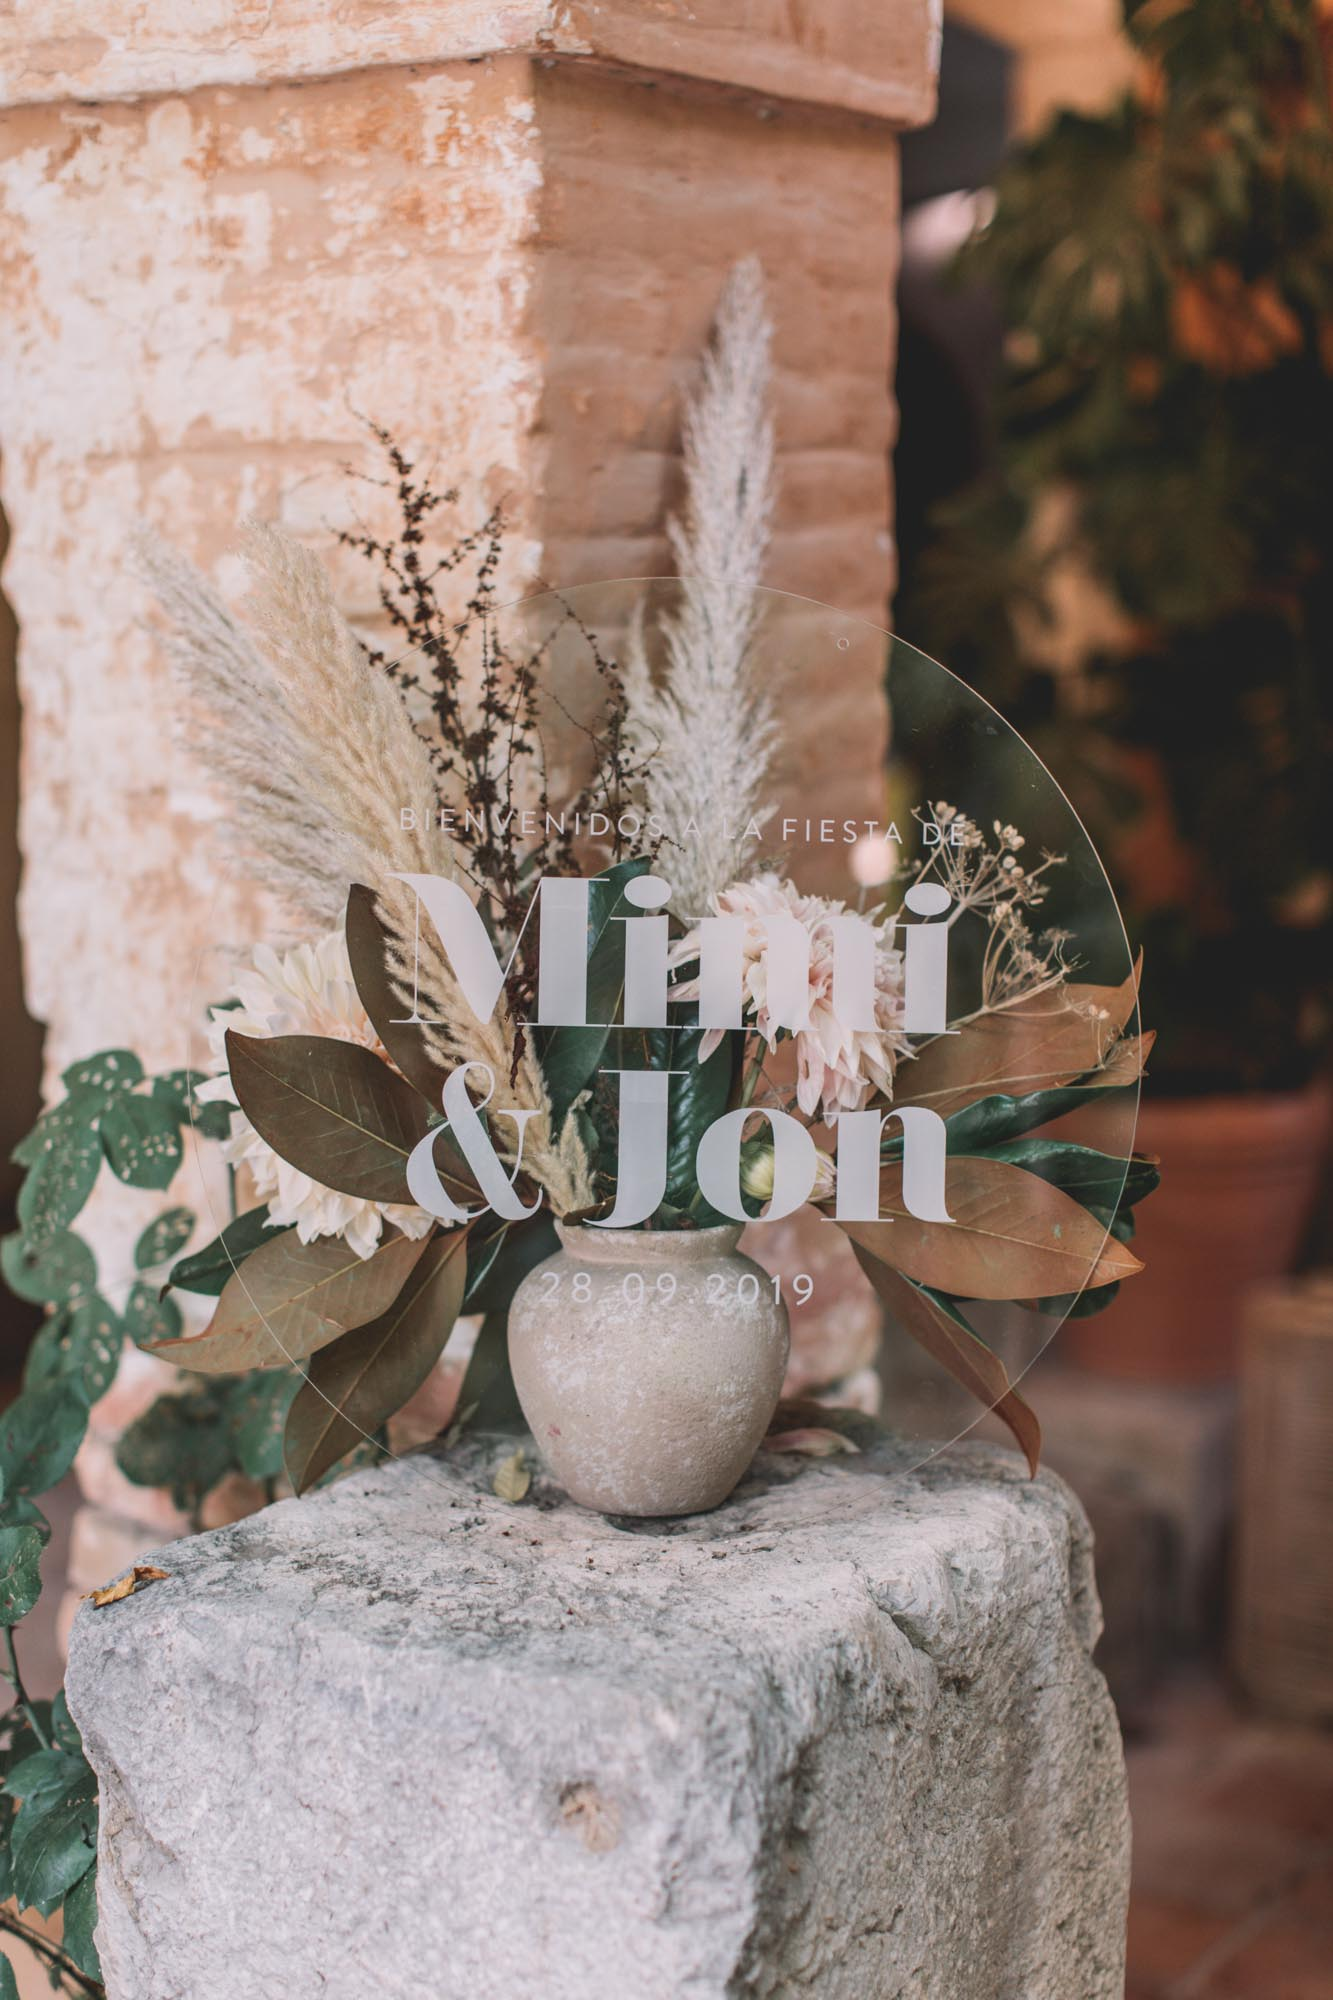 MIMI + JON_VILLA CATALINA_BARCELONE_PHOTOGRAPHE_MARIAGE_LES BANDITS-1